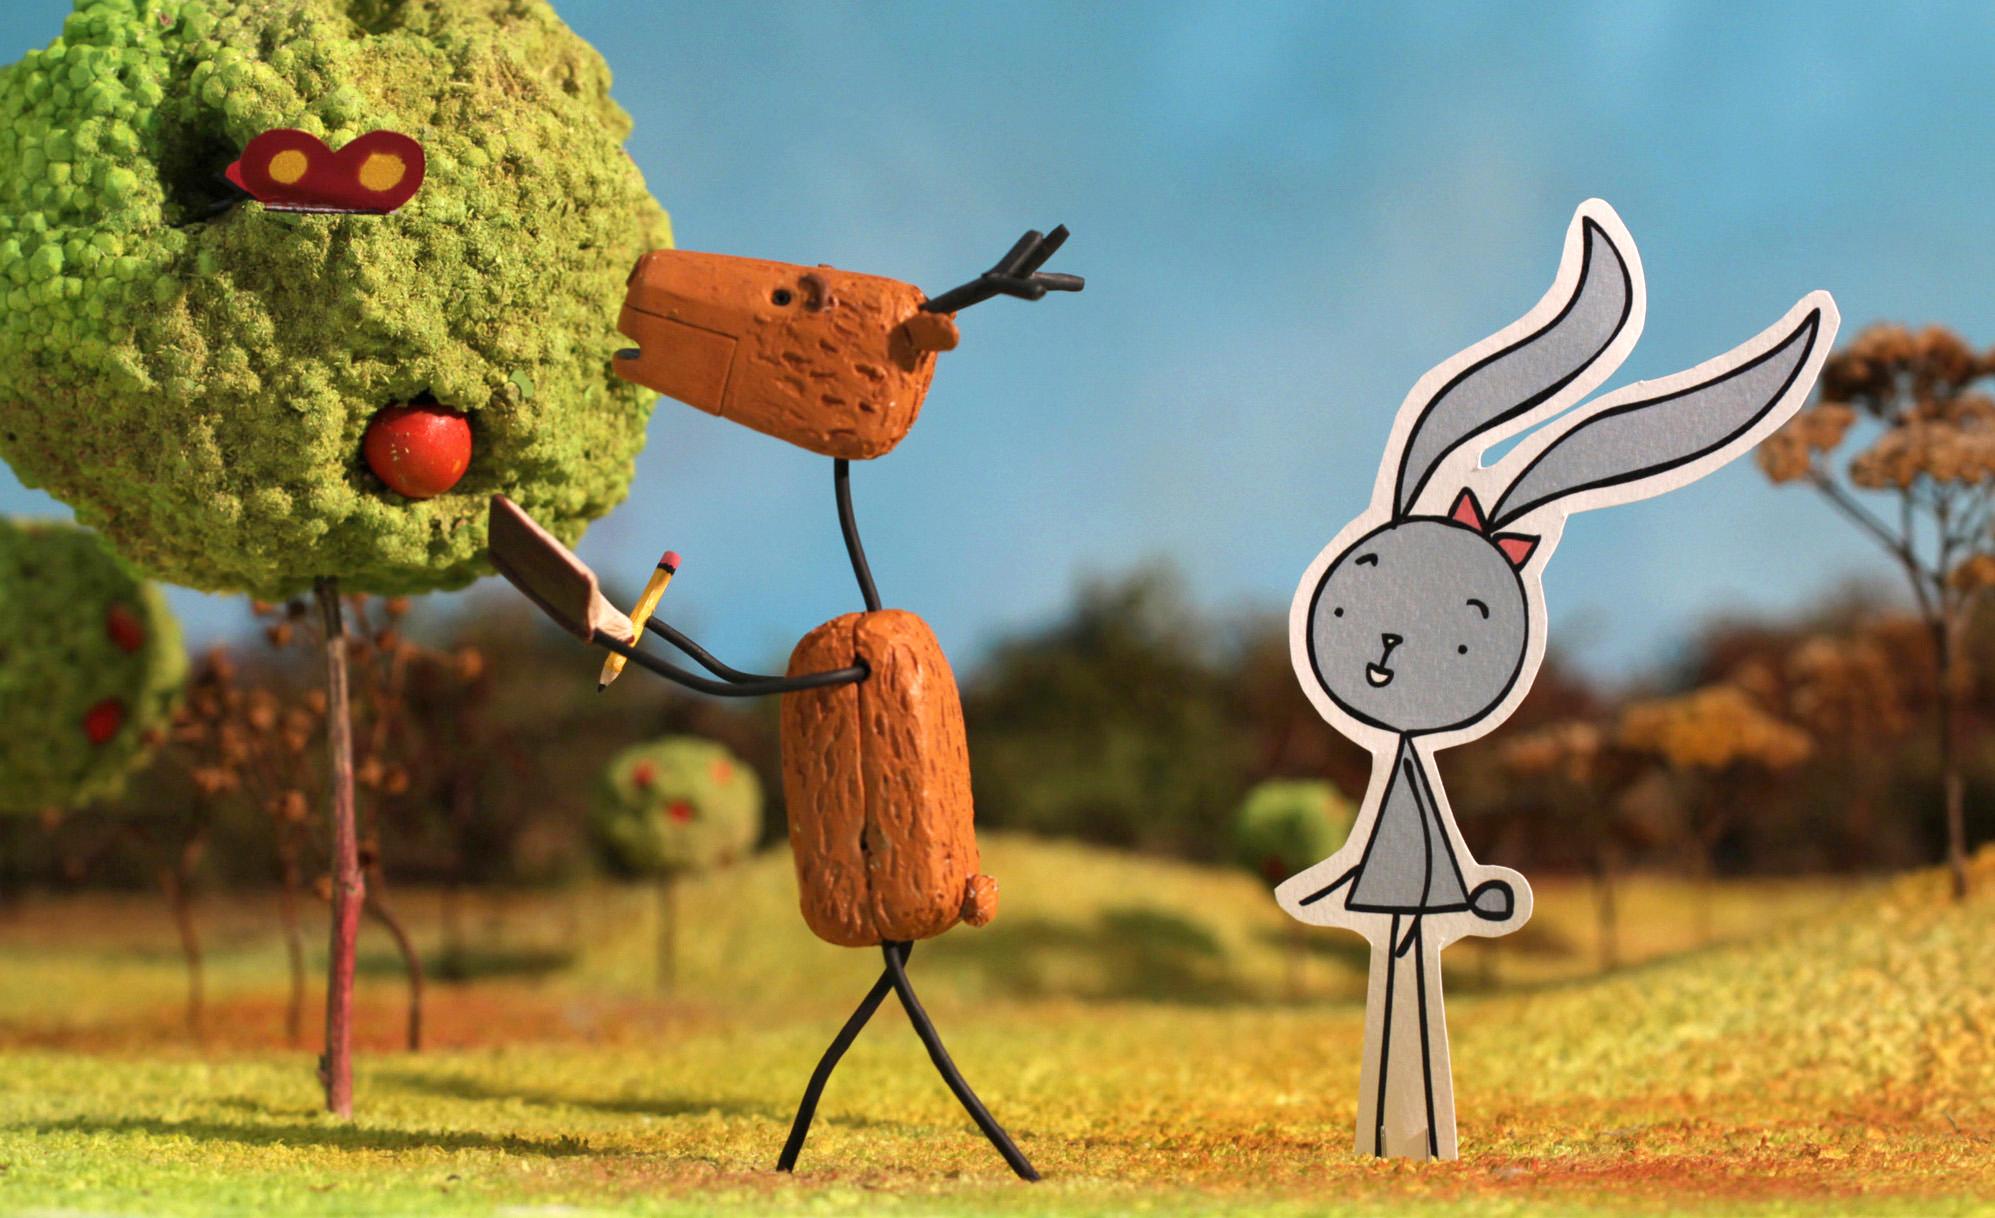 RabbitAndDeer_04.jpg